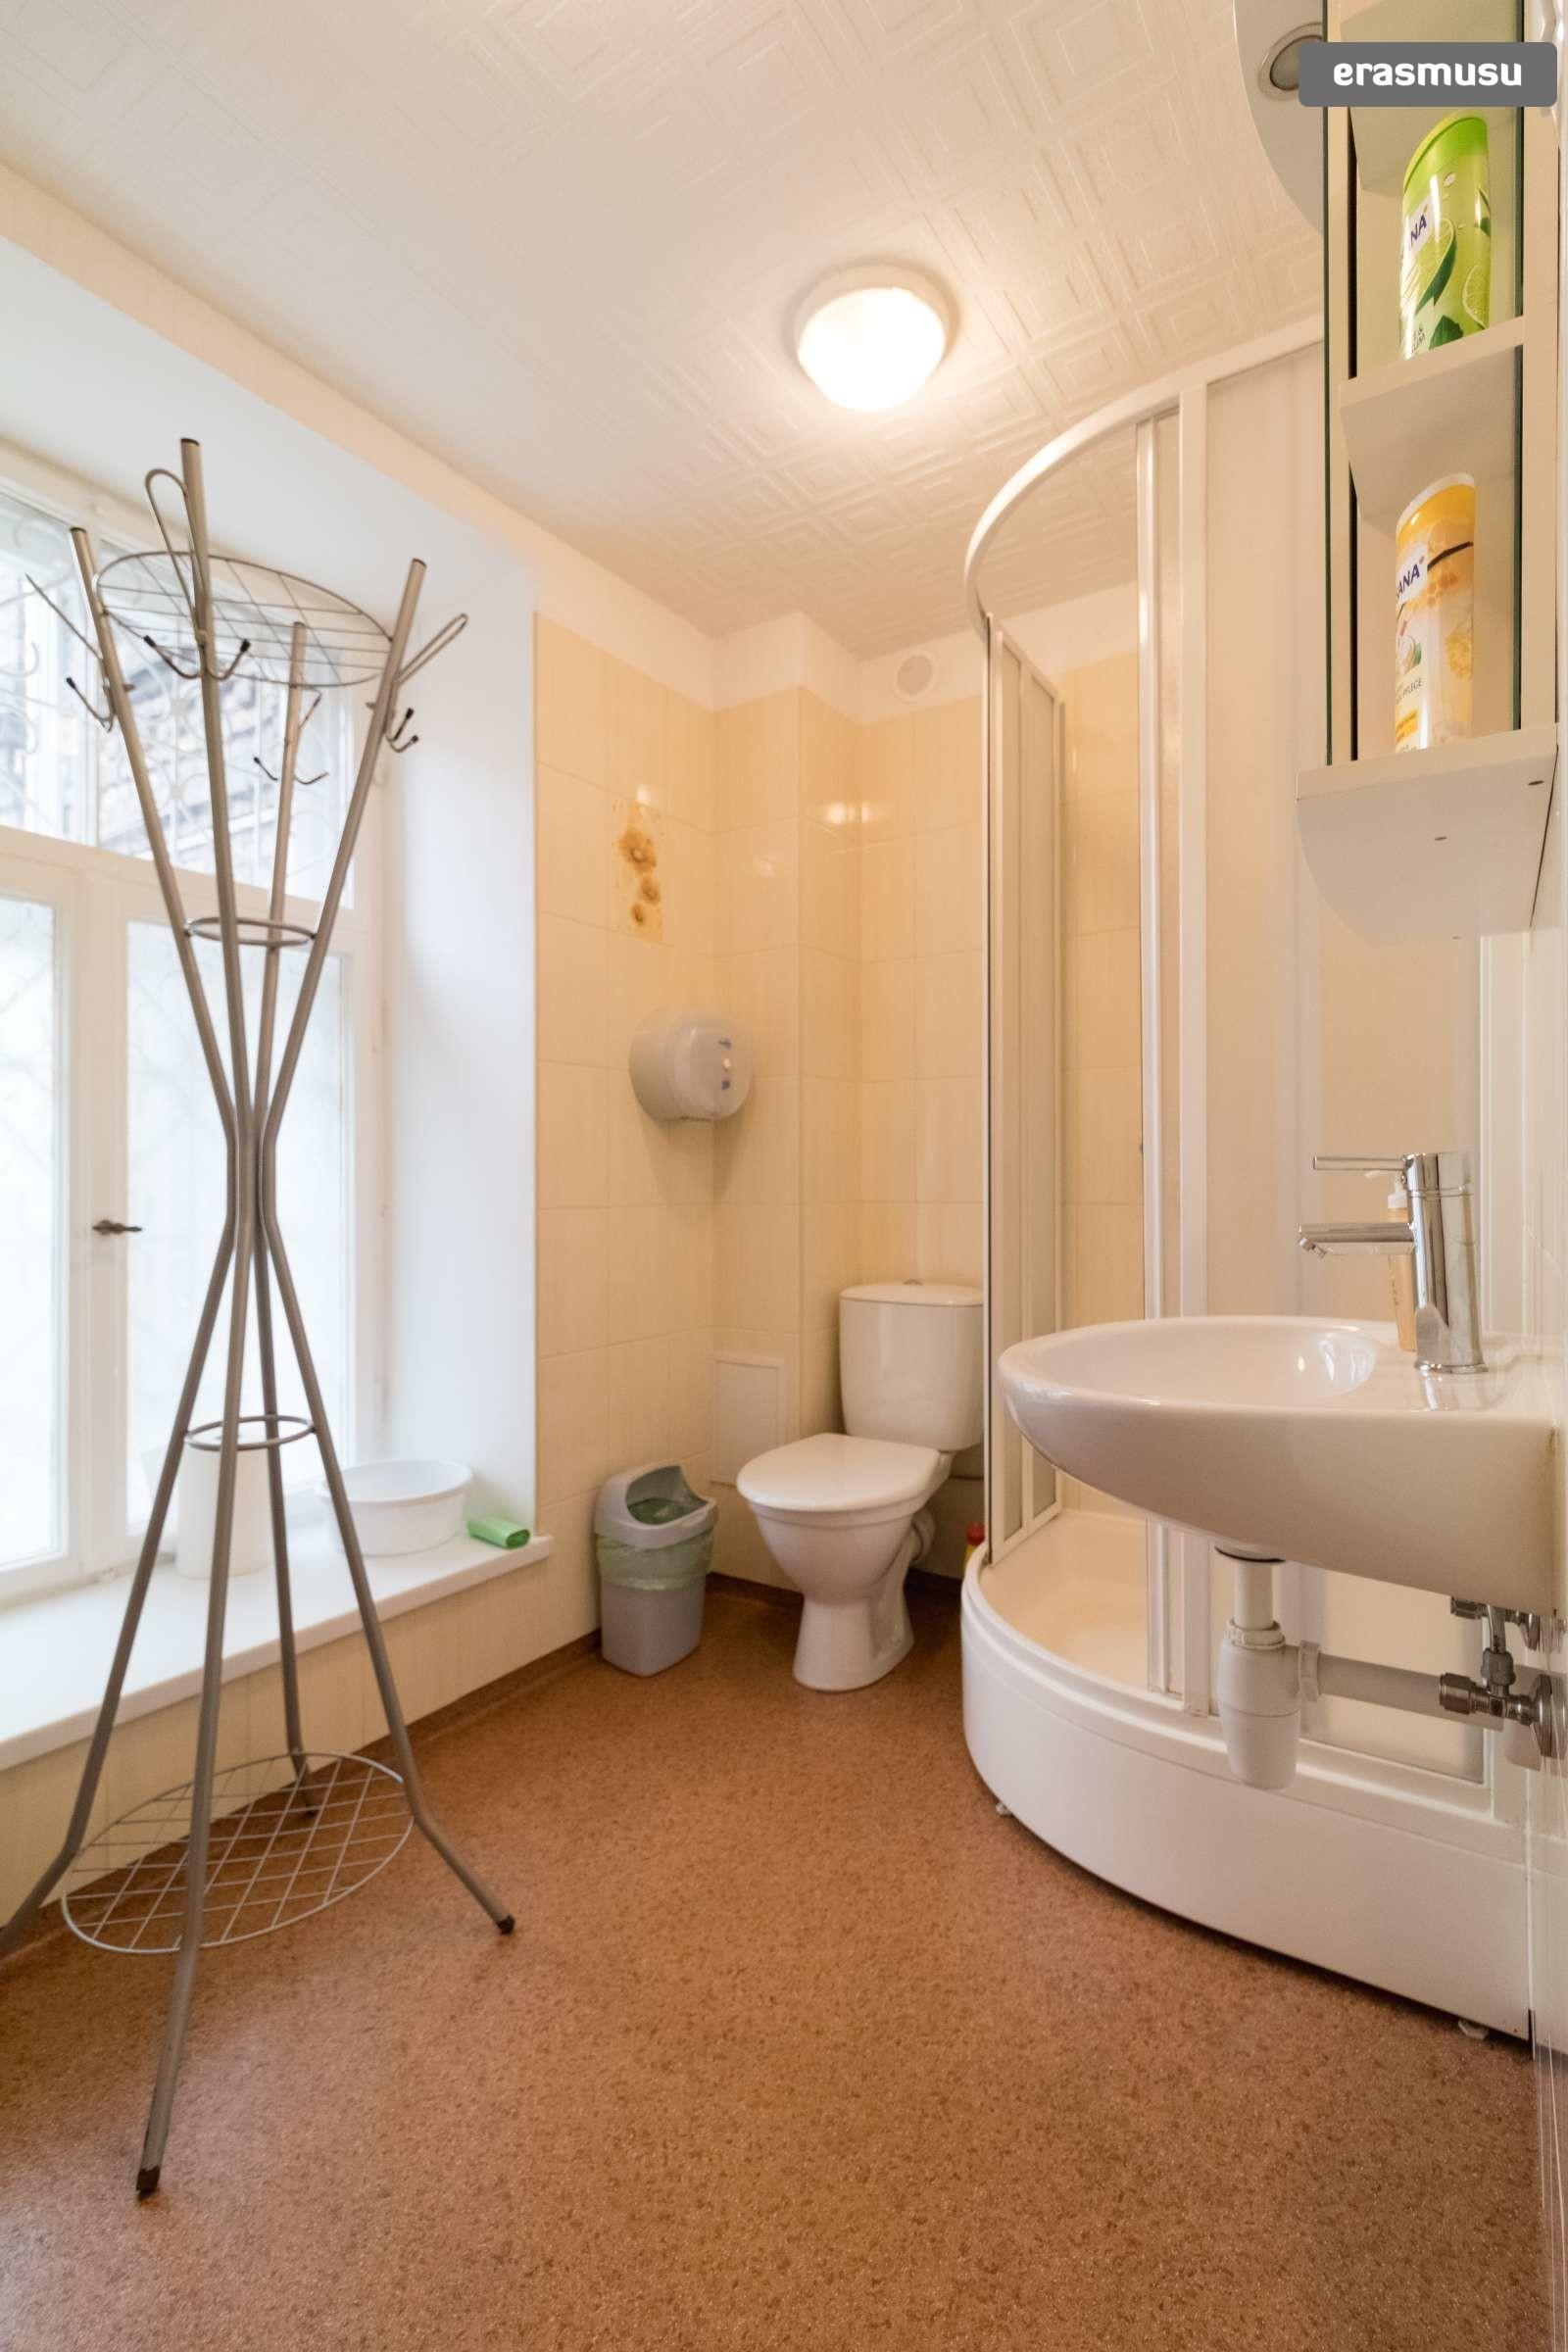 spacious-3-bedroom-apartment-rent-avoti-d53e3be8299bd461c10881fa